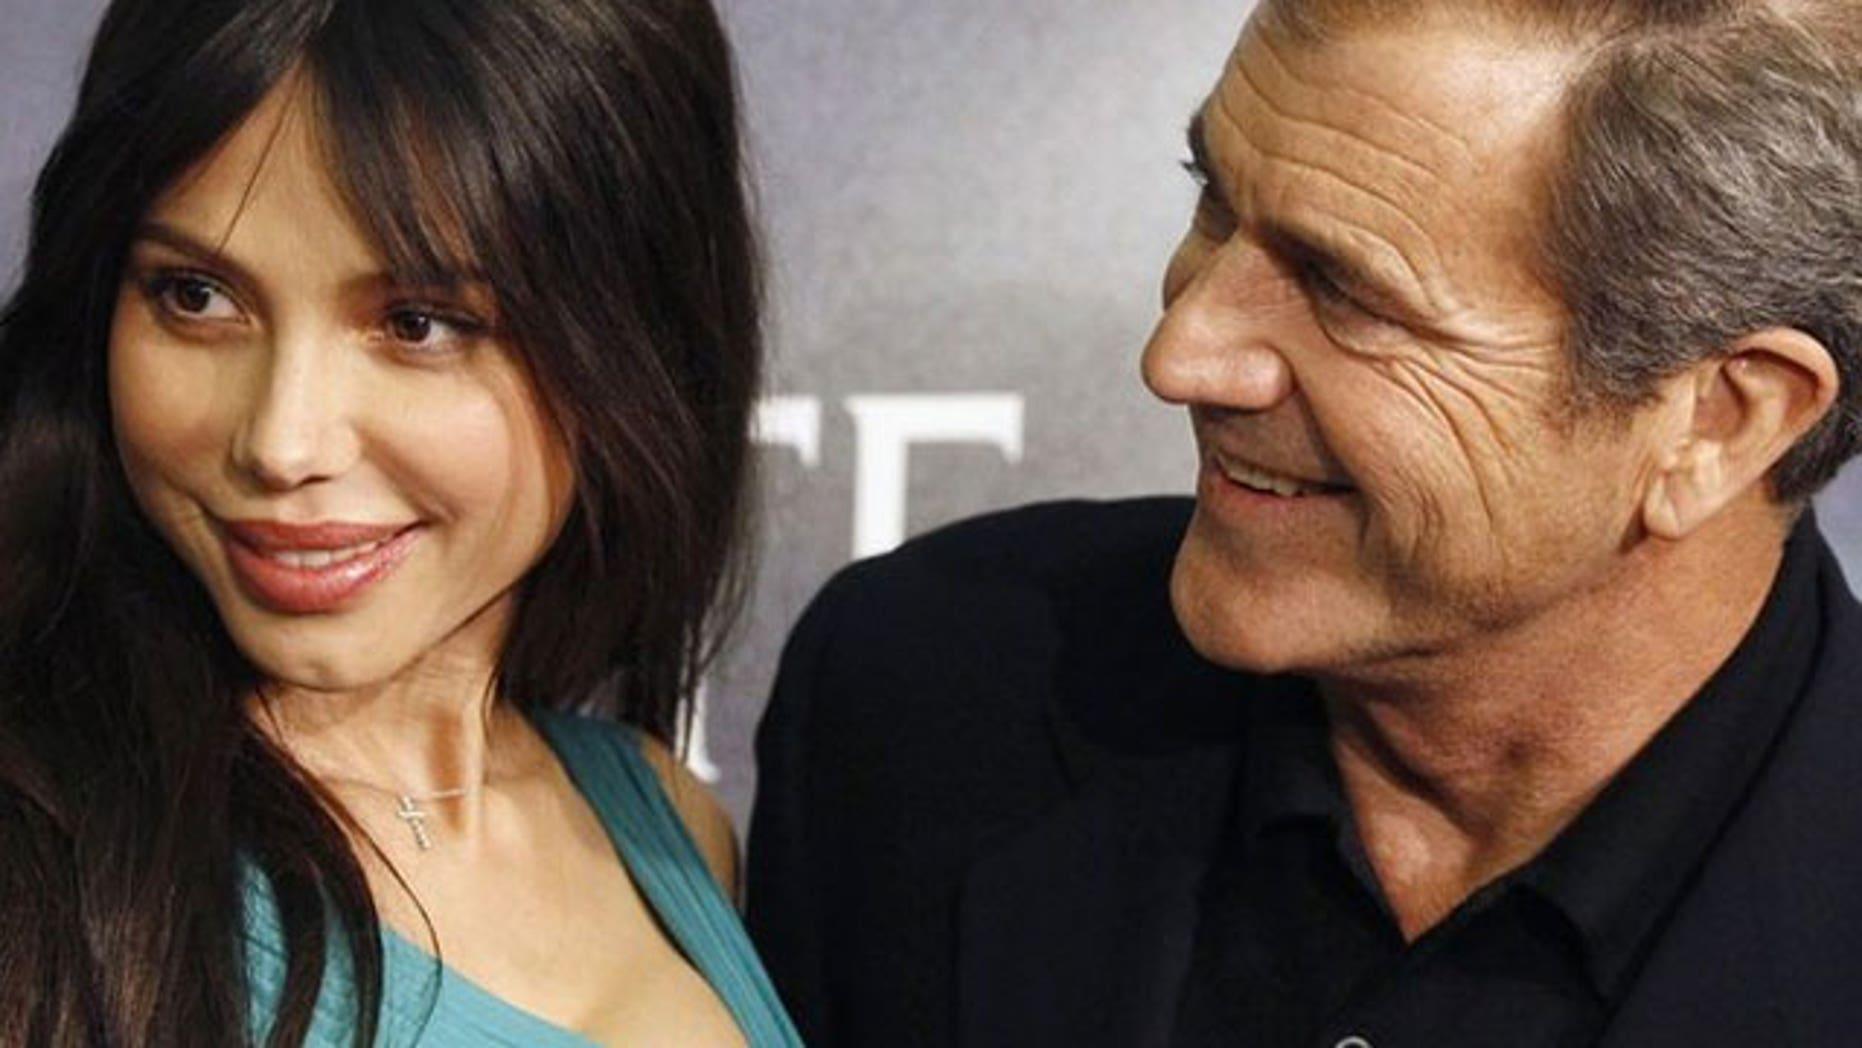 Oksana Grigorieva and Mel Gibson in happier times in 2009.